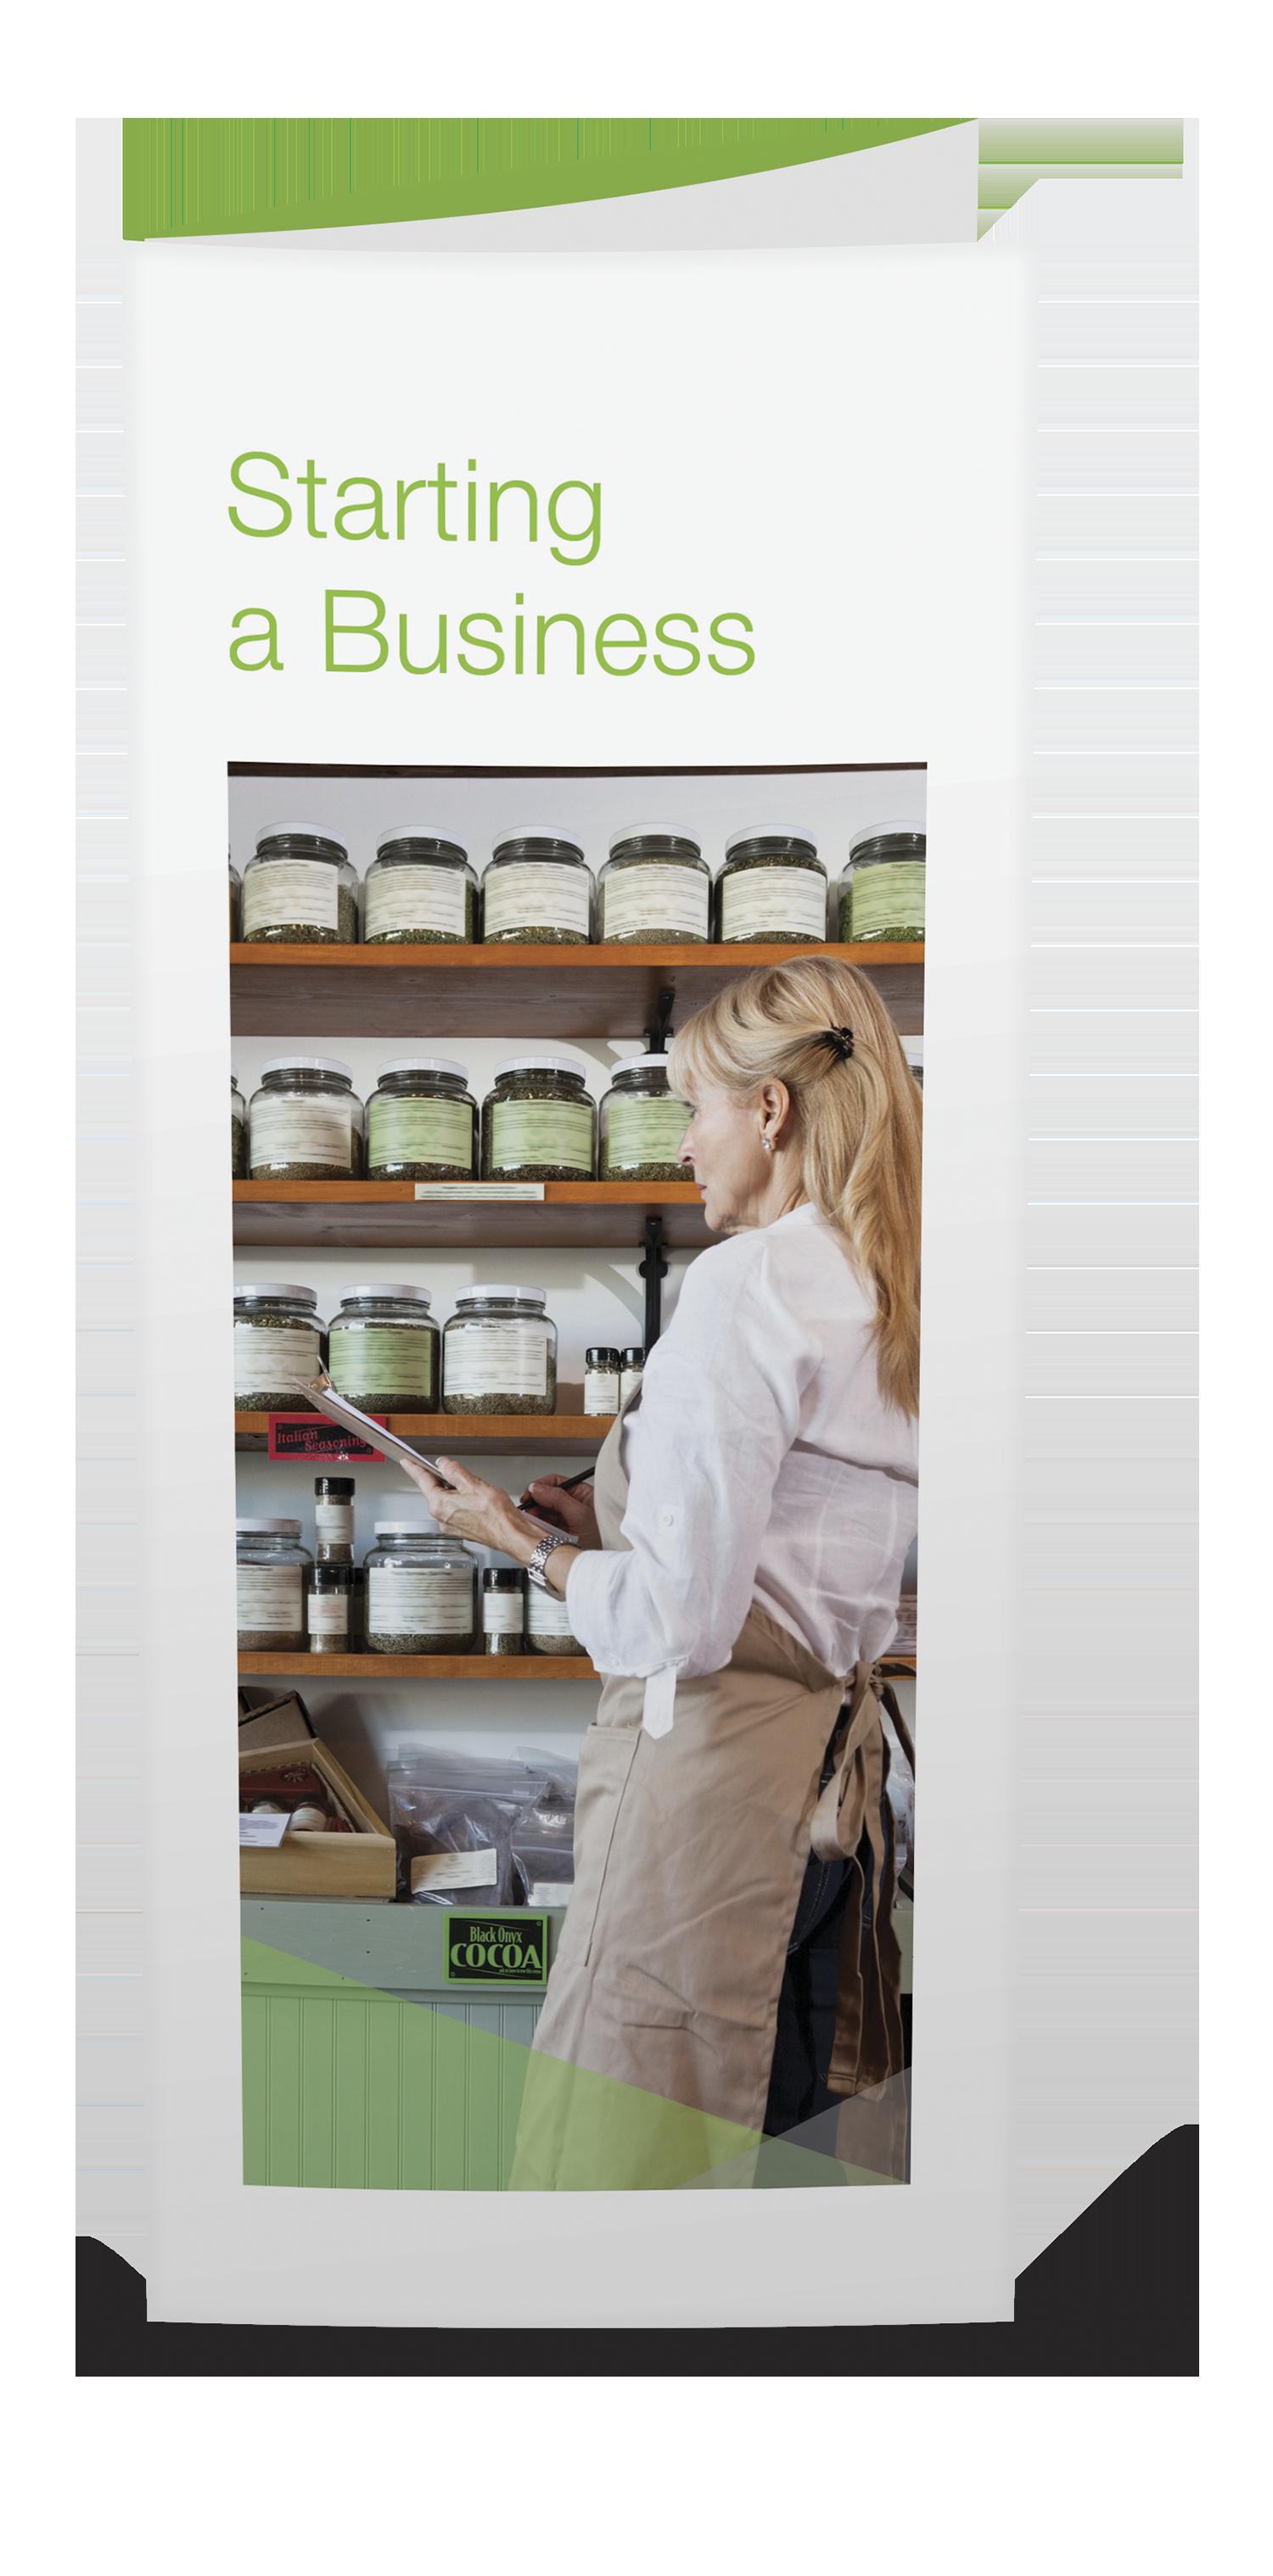 Starting a Business Brochures - 25/pkg - #843